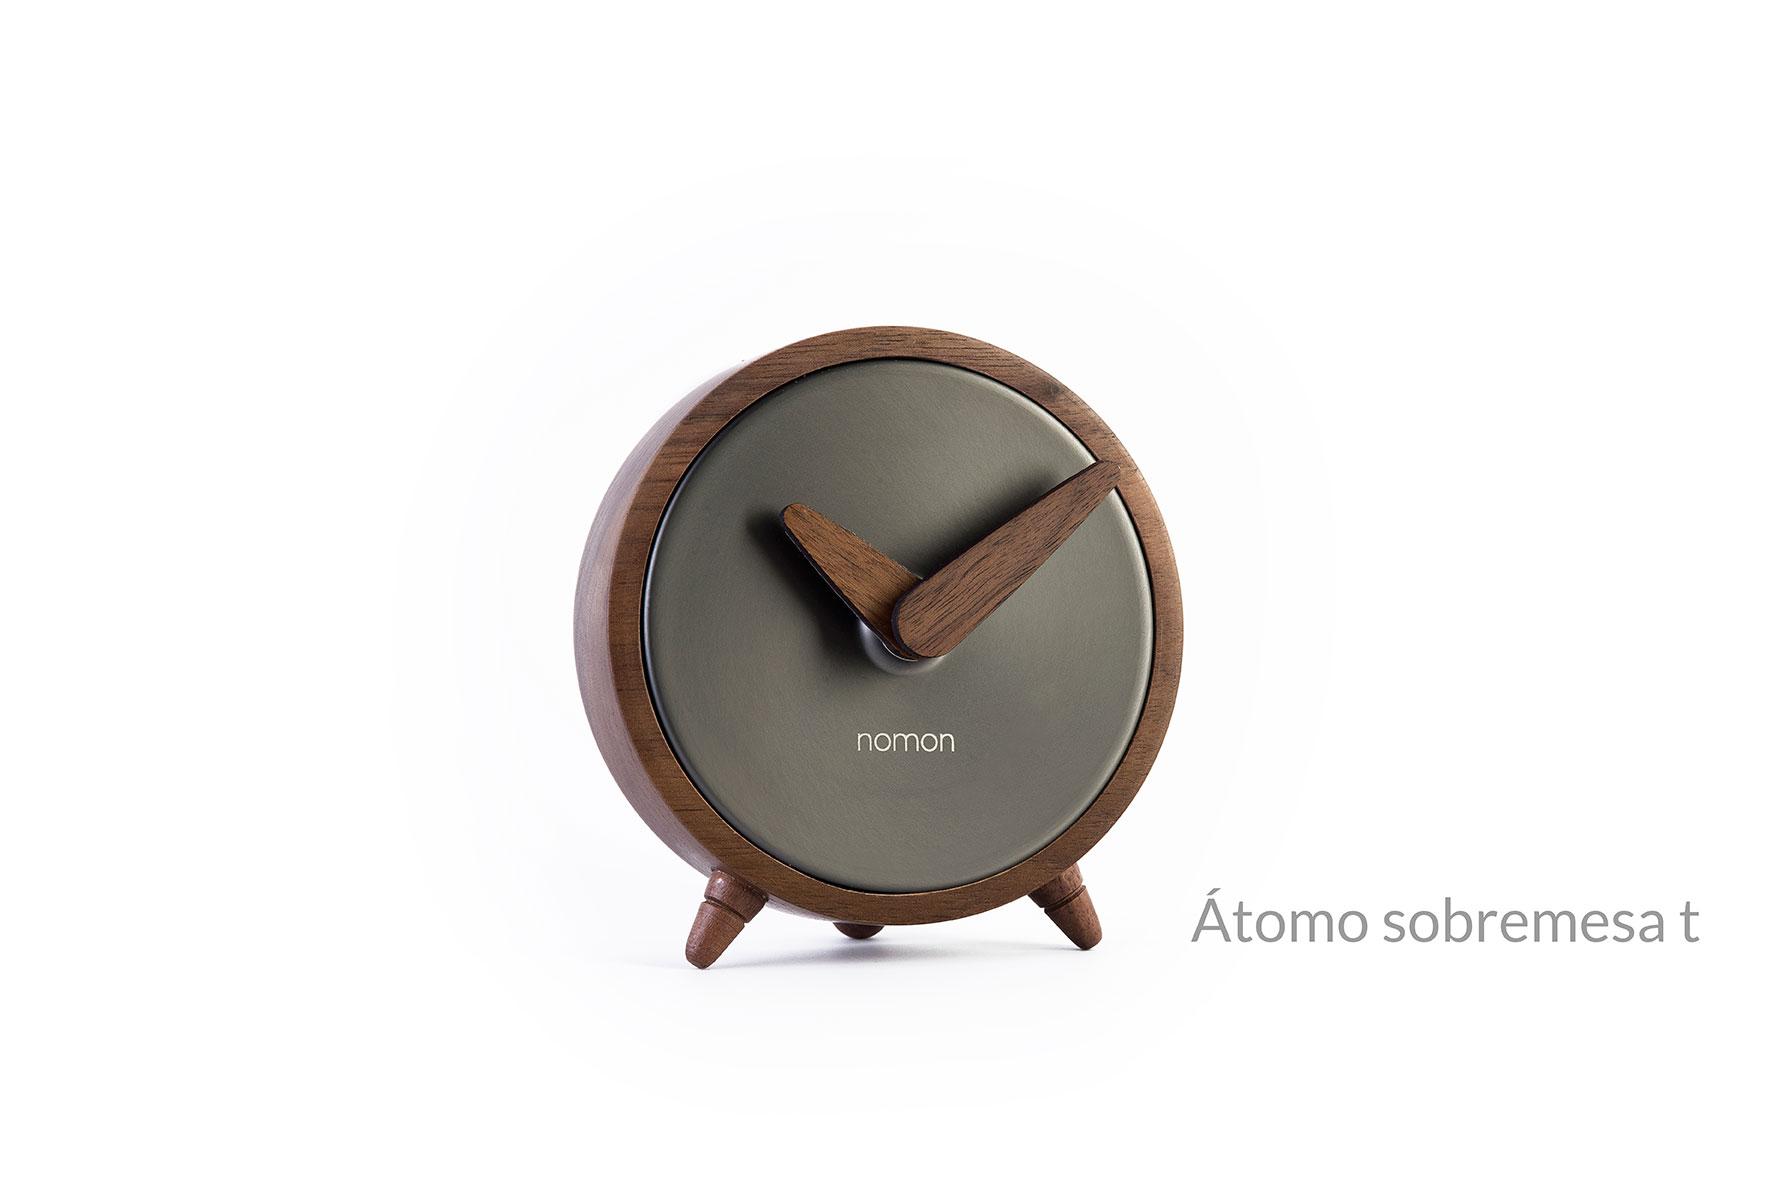 Atomo Sobremesa Nomon 5